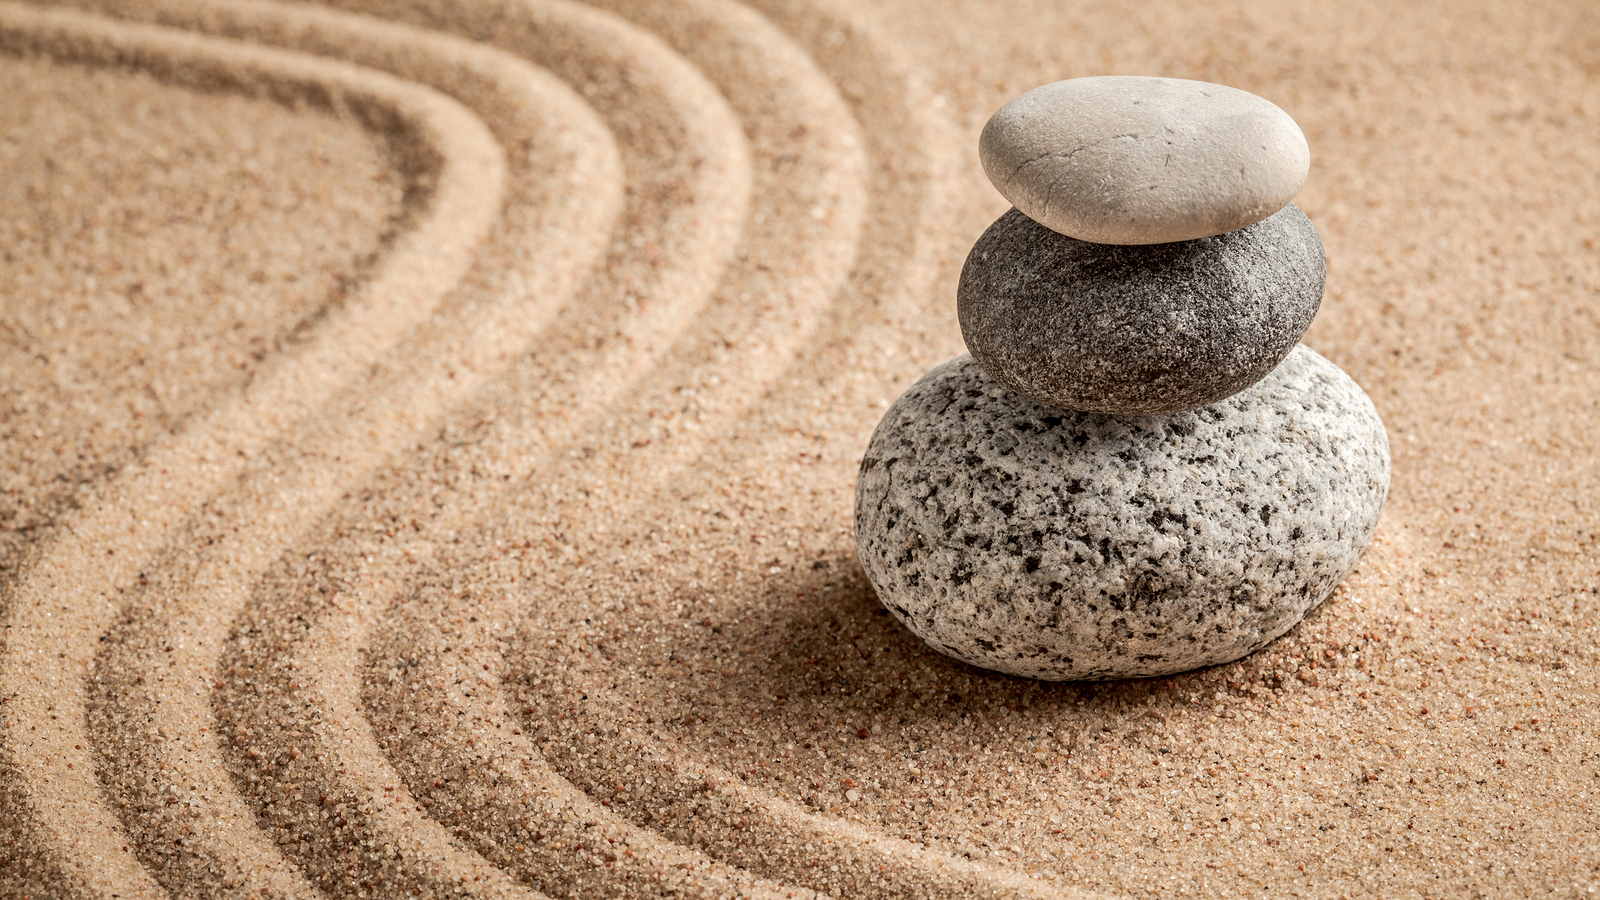 Japanese Zen stone garden - relaxation, meditation